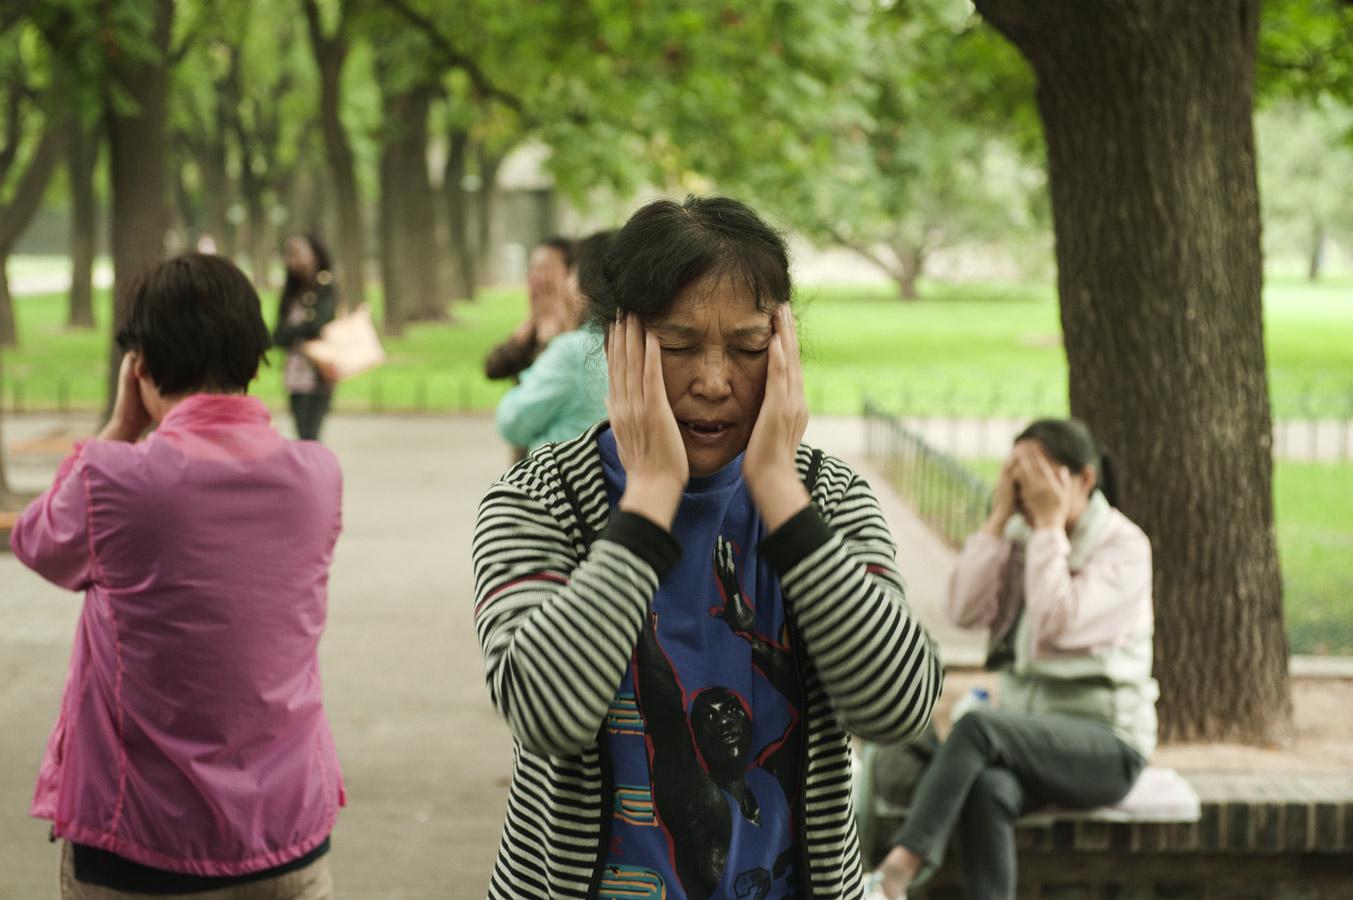 Jamie-Lowe-Photography-Park-Life-Beijing_3.jpg